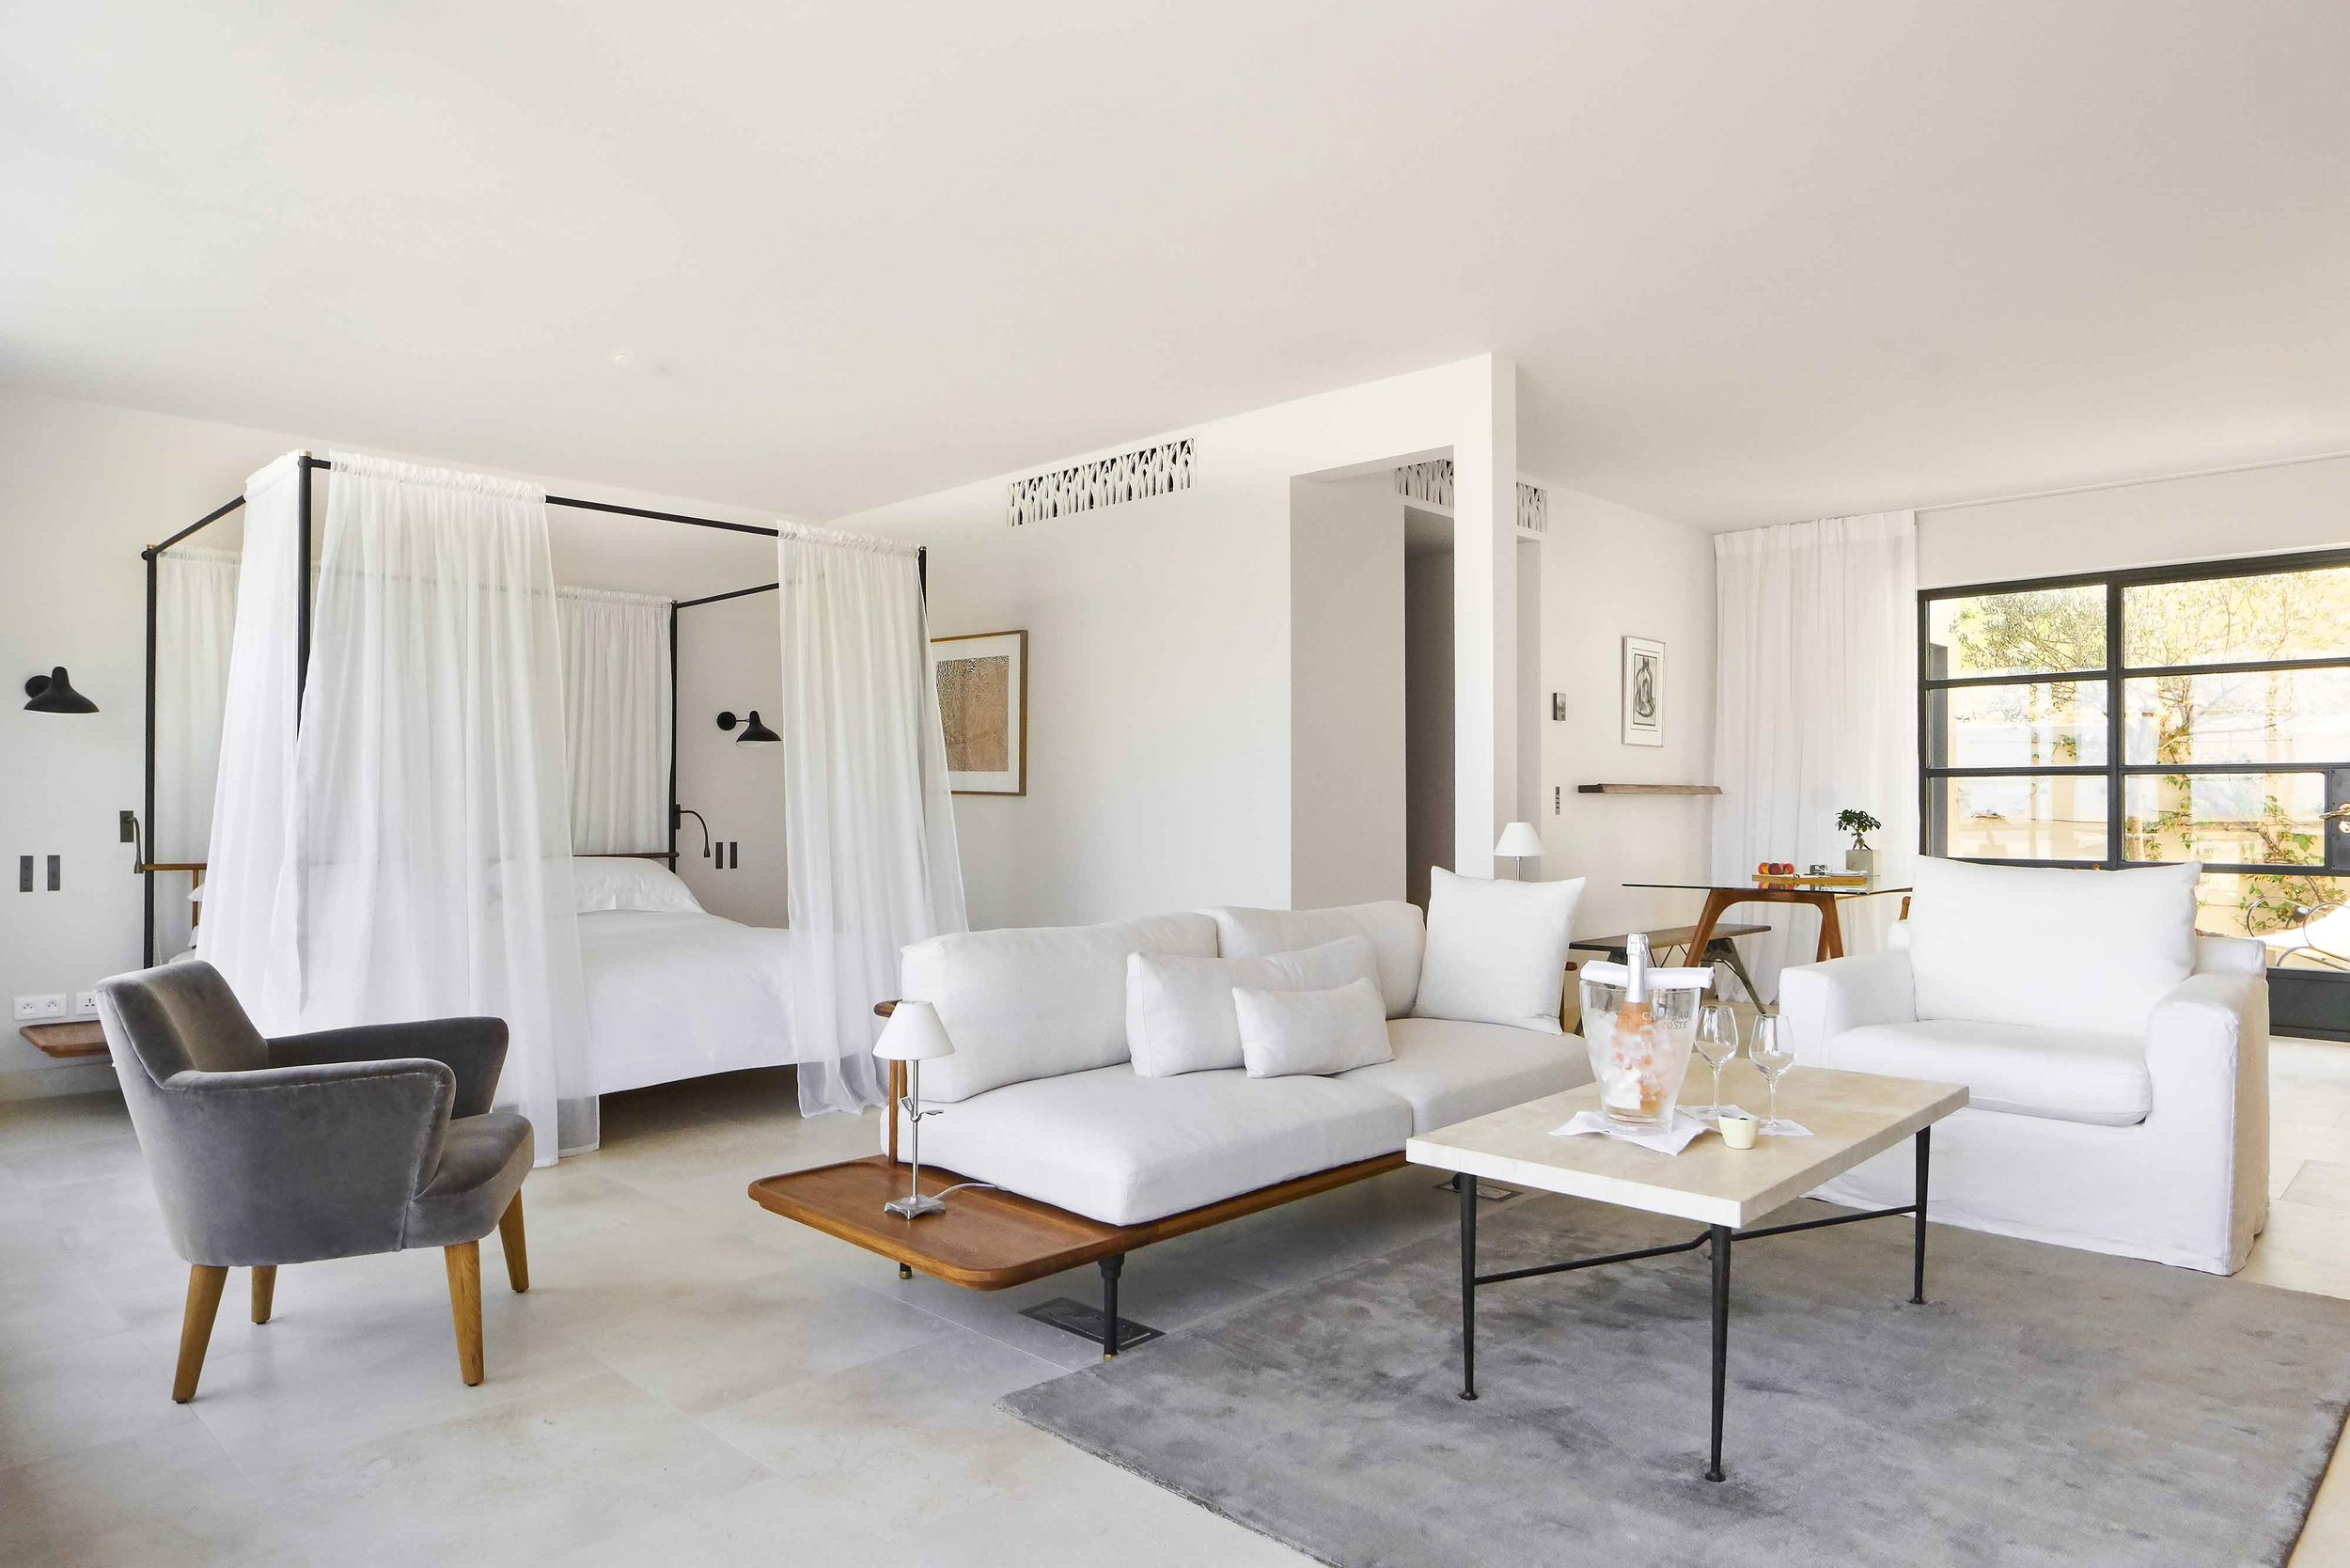 Villa la Coste_Best Smith Hotel_Mr & Mrs Smith Hotel Awards 2018 (1).jpg